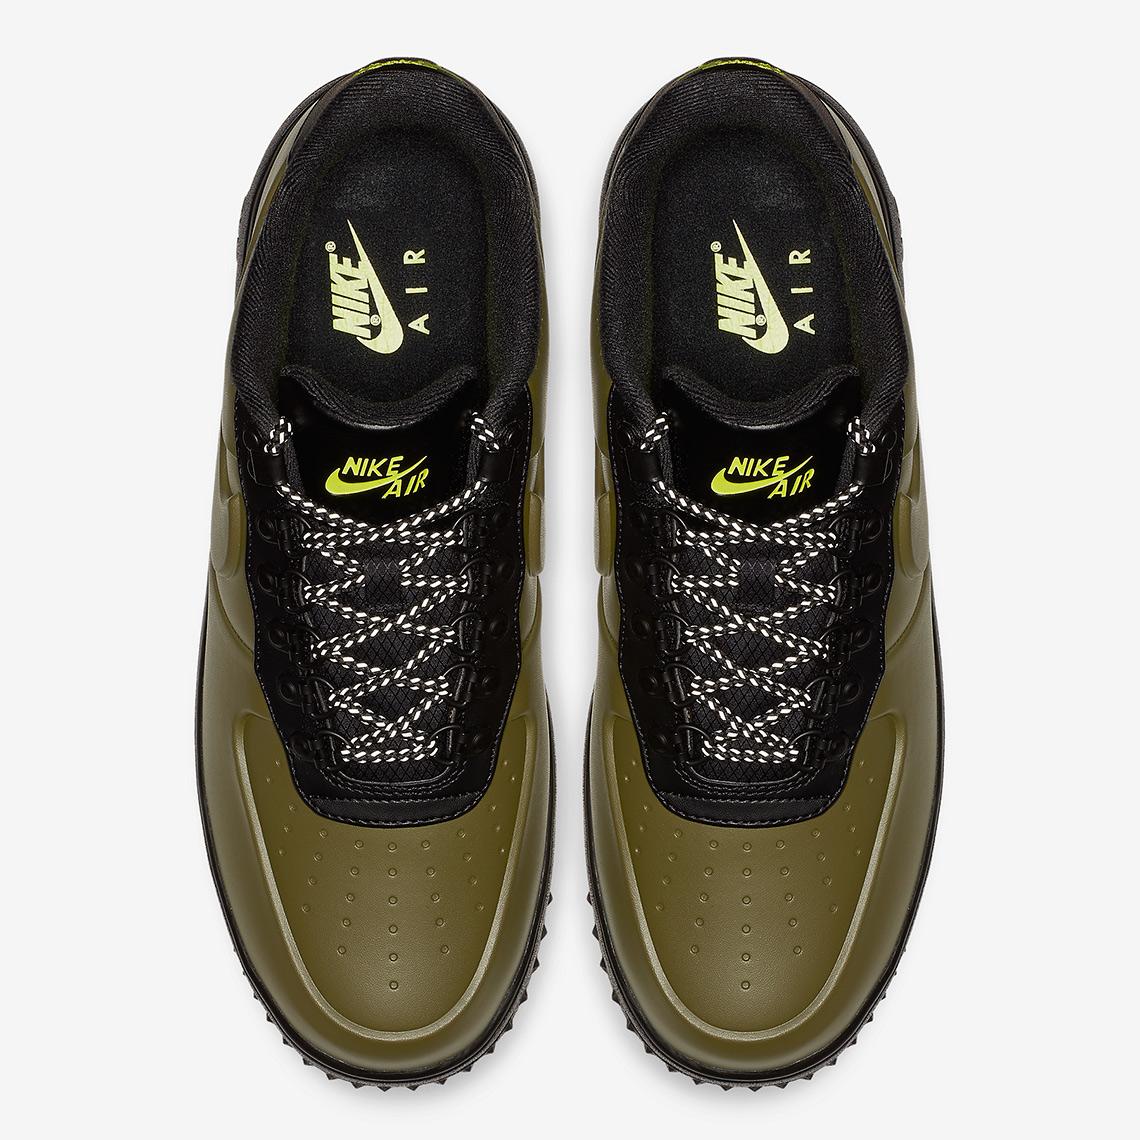 nike air force 1 duckboot aa1125 301 1 - Nike Lunar Force 1 Duckboot 2018 Release Info